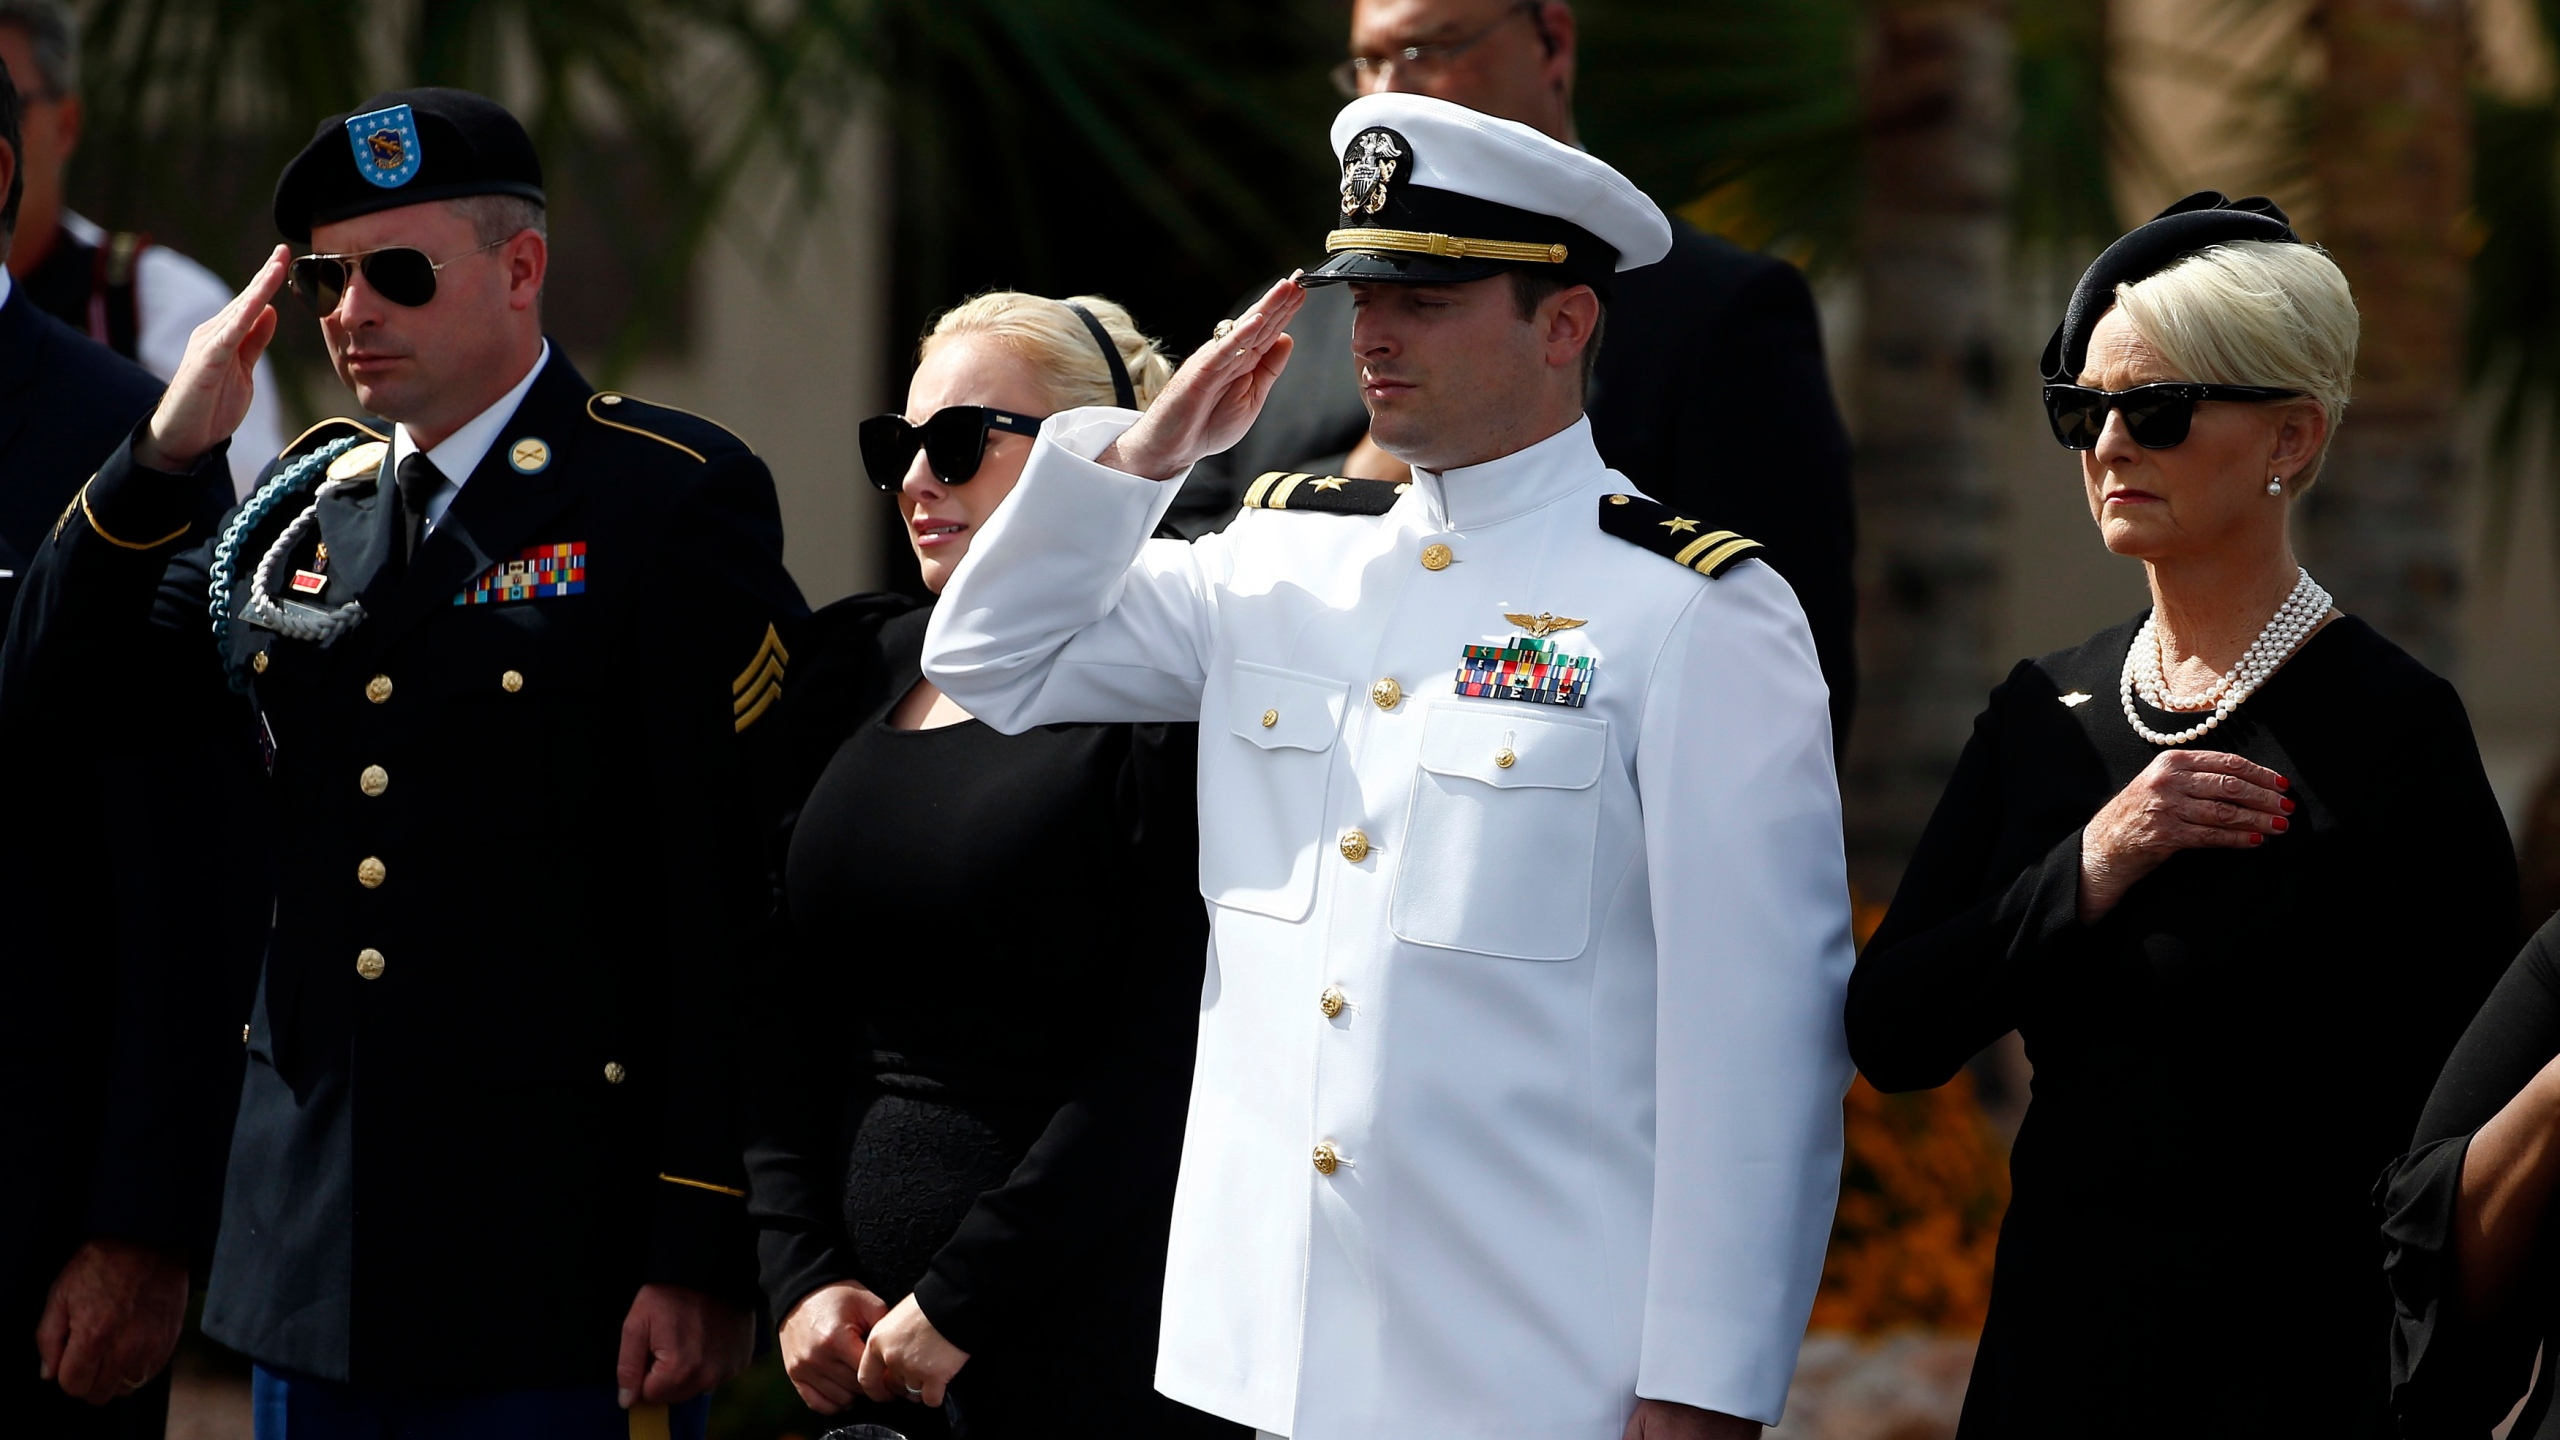 McCain_22406-159532.jpg53267046